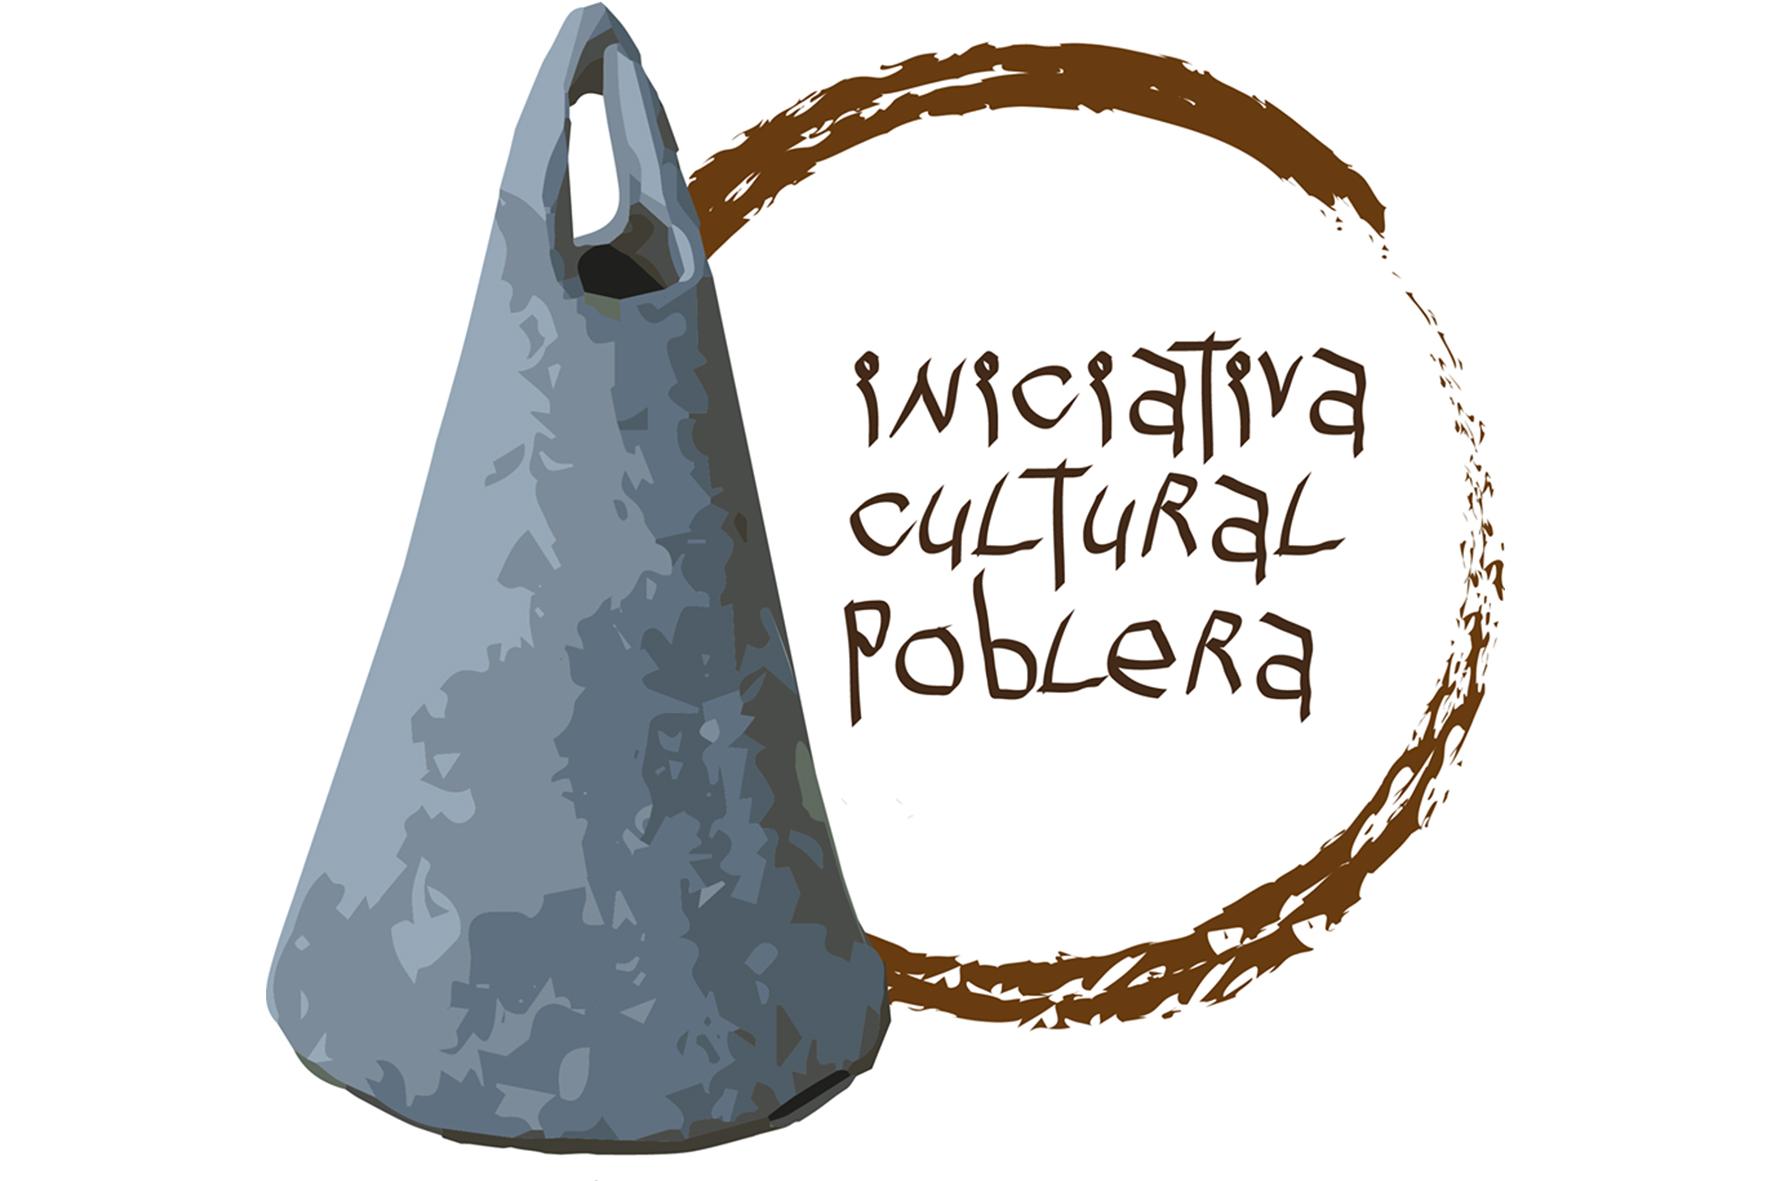 Iniciativa Cultural Poblera